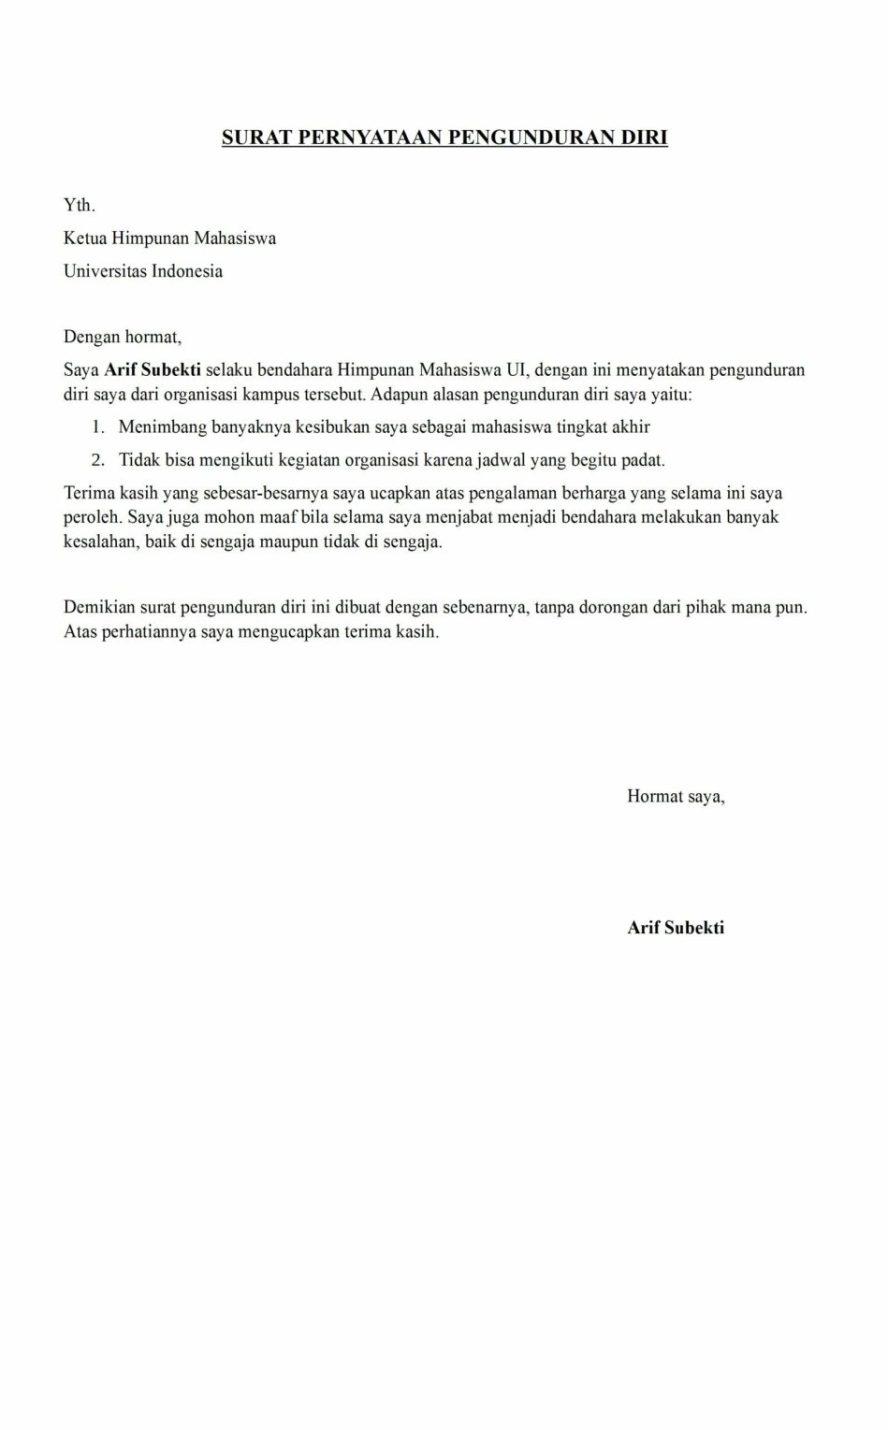 14. Contoh Surat Resign Organisasi Kampus